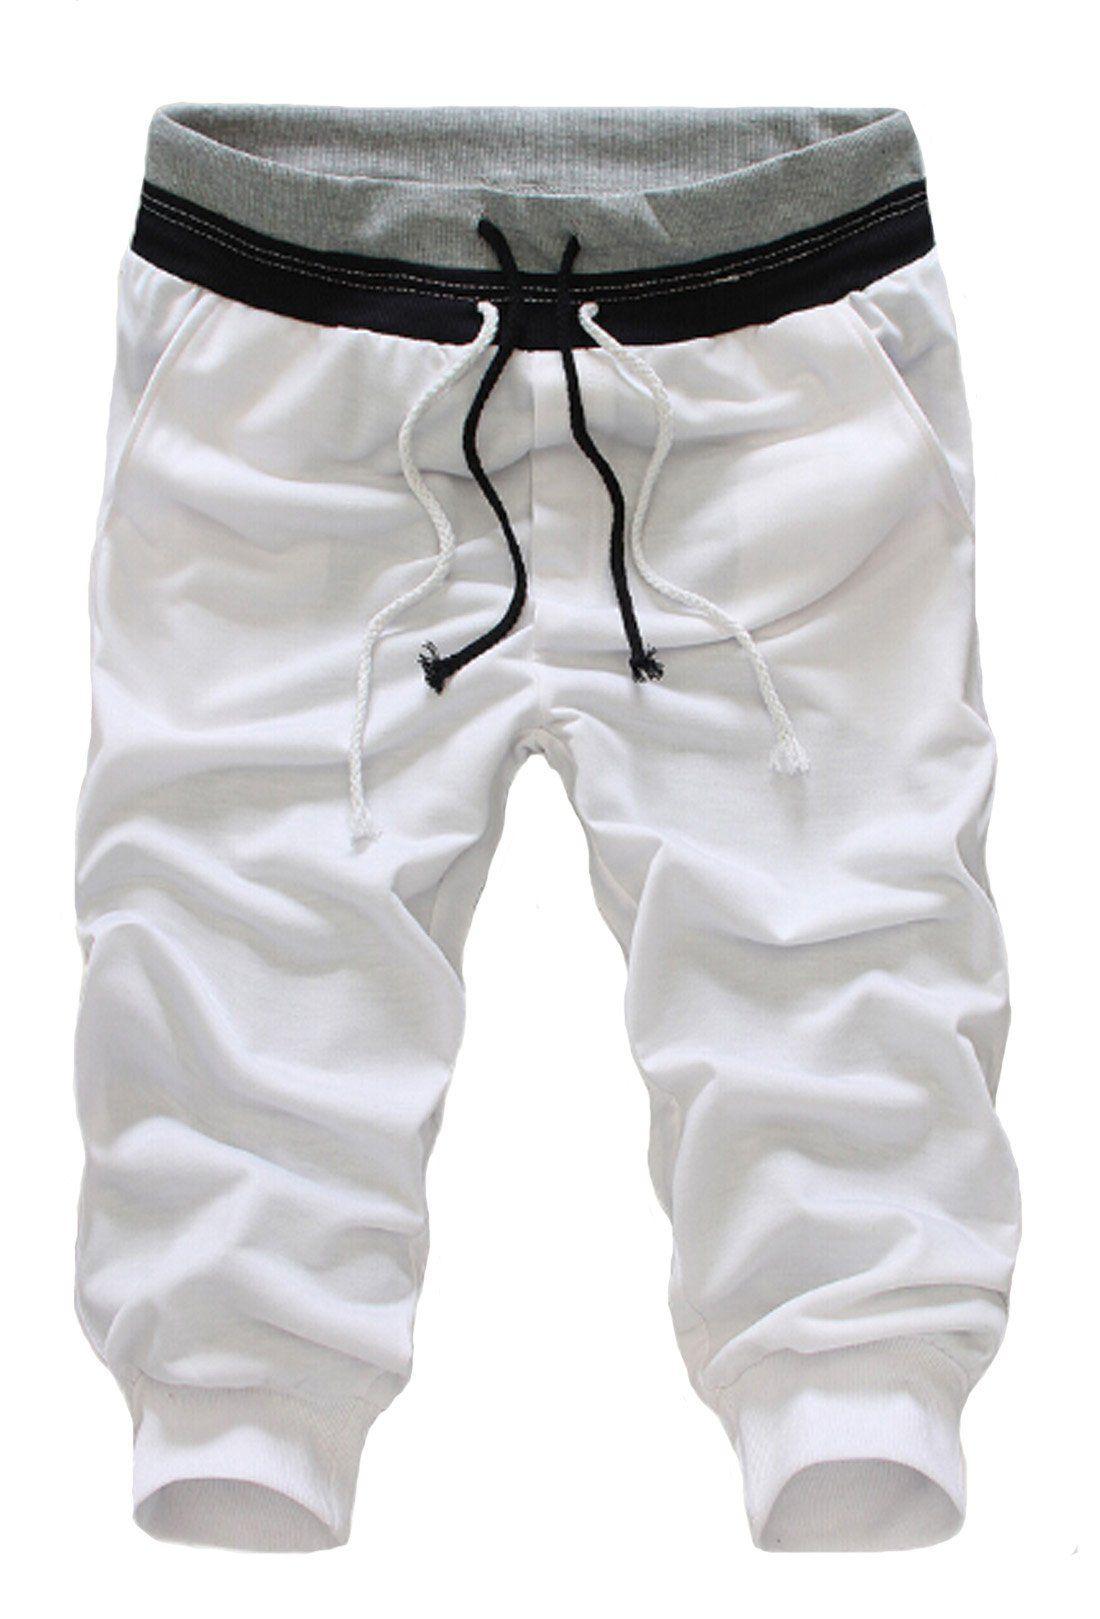 Men`s Summer Loose Baggy Hip-hop Sports Shorts Drawstring Running Pants Trousers